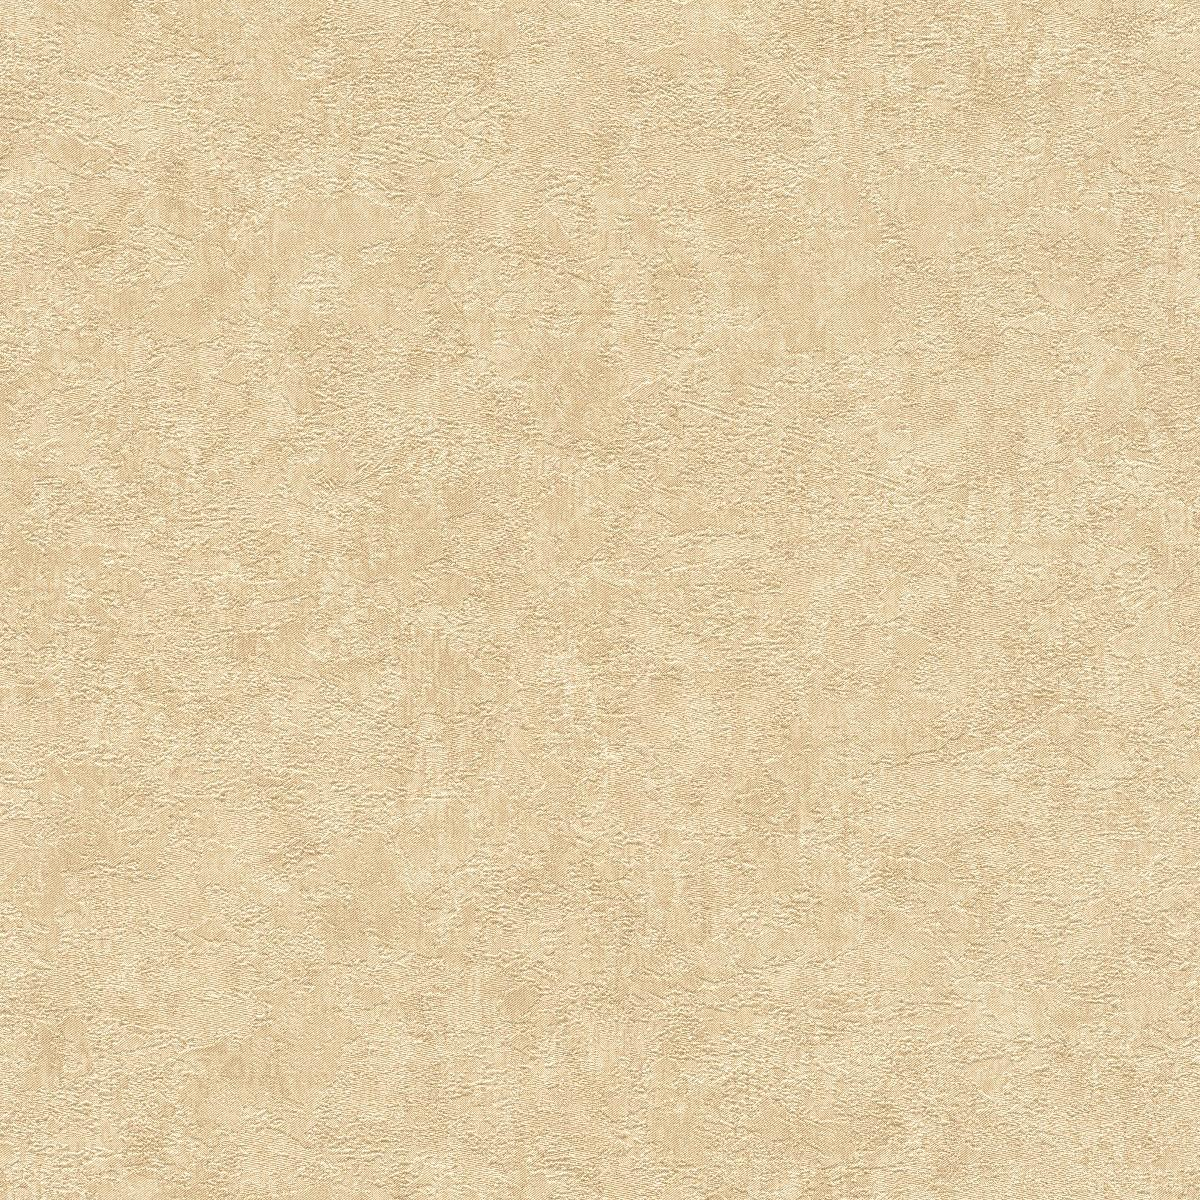 Обои флизелиновые Rasch Fiore бежевые 1.06 м 935974